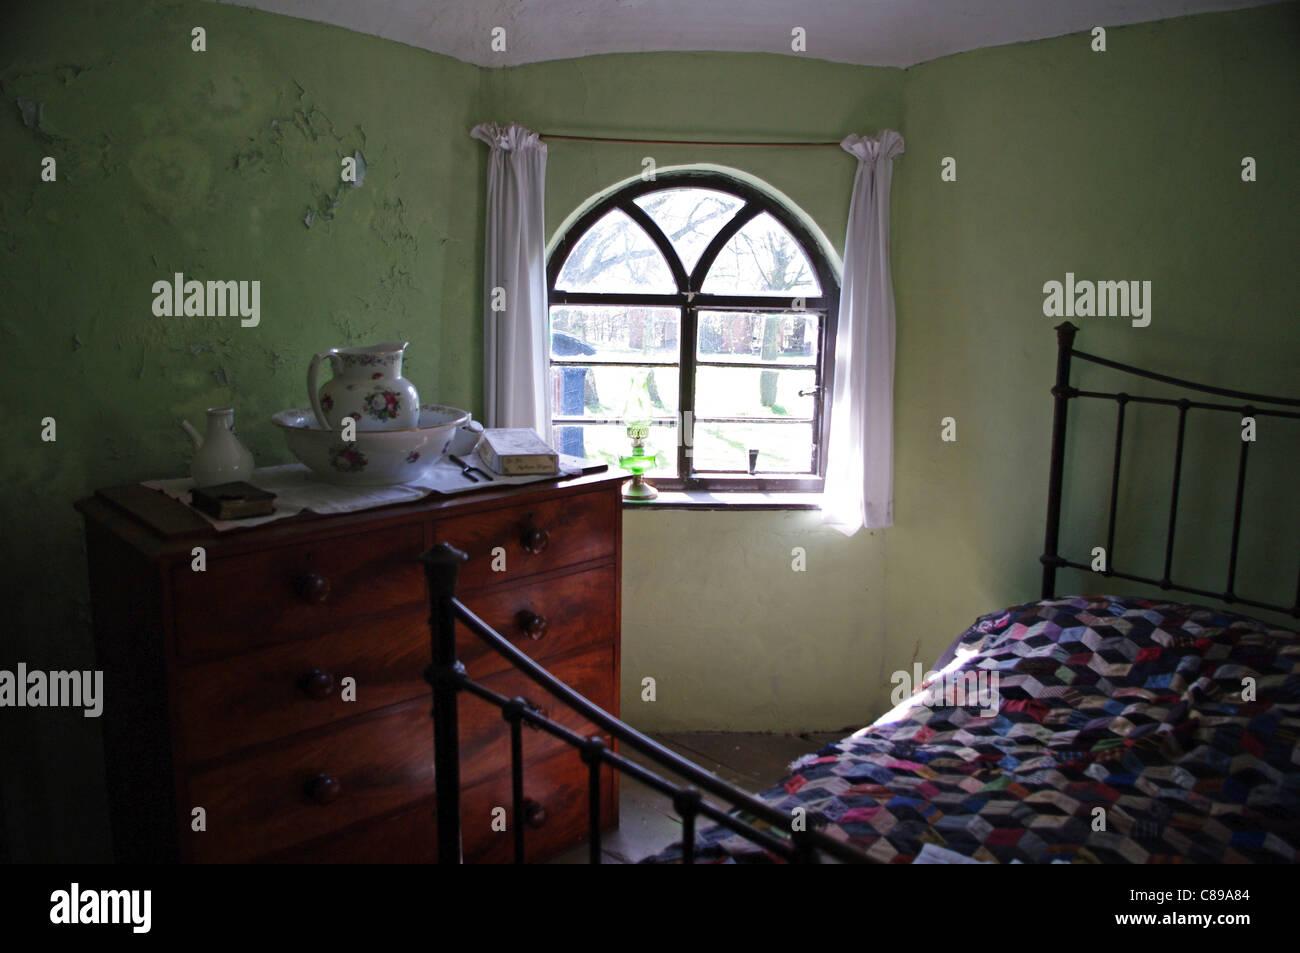 Inside tollhouse bedroom, Avoncroft Museum of Buildings, Bromsgrove - Stock Image